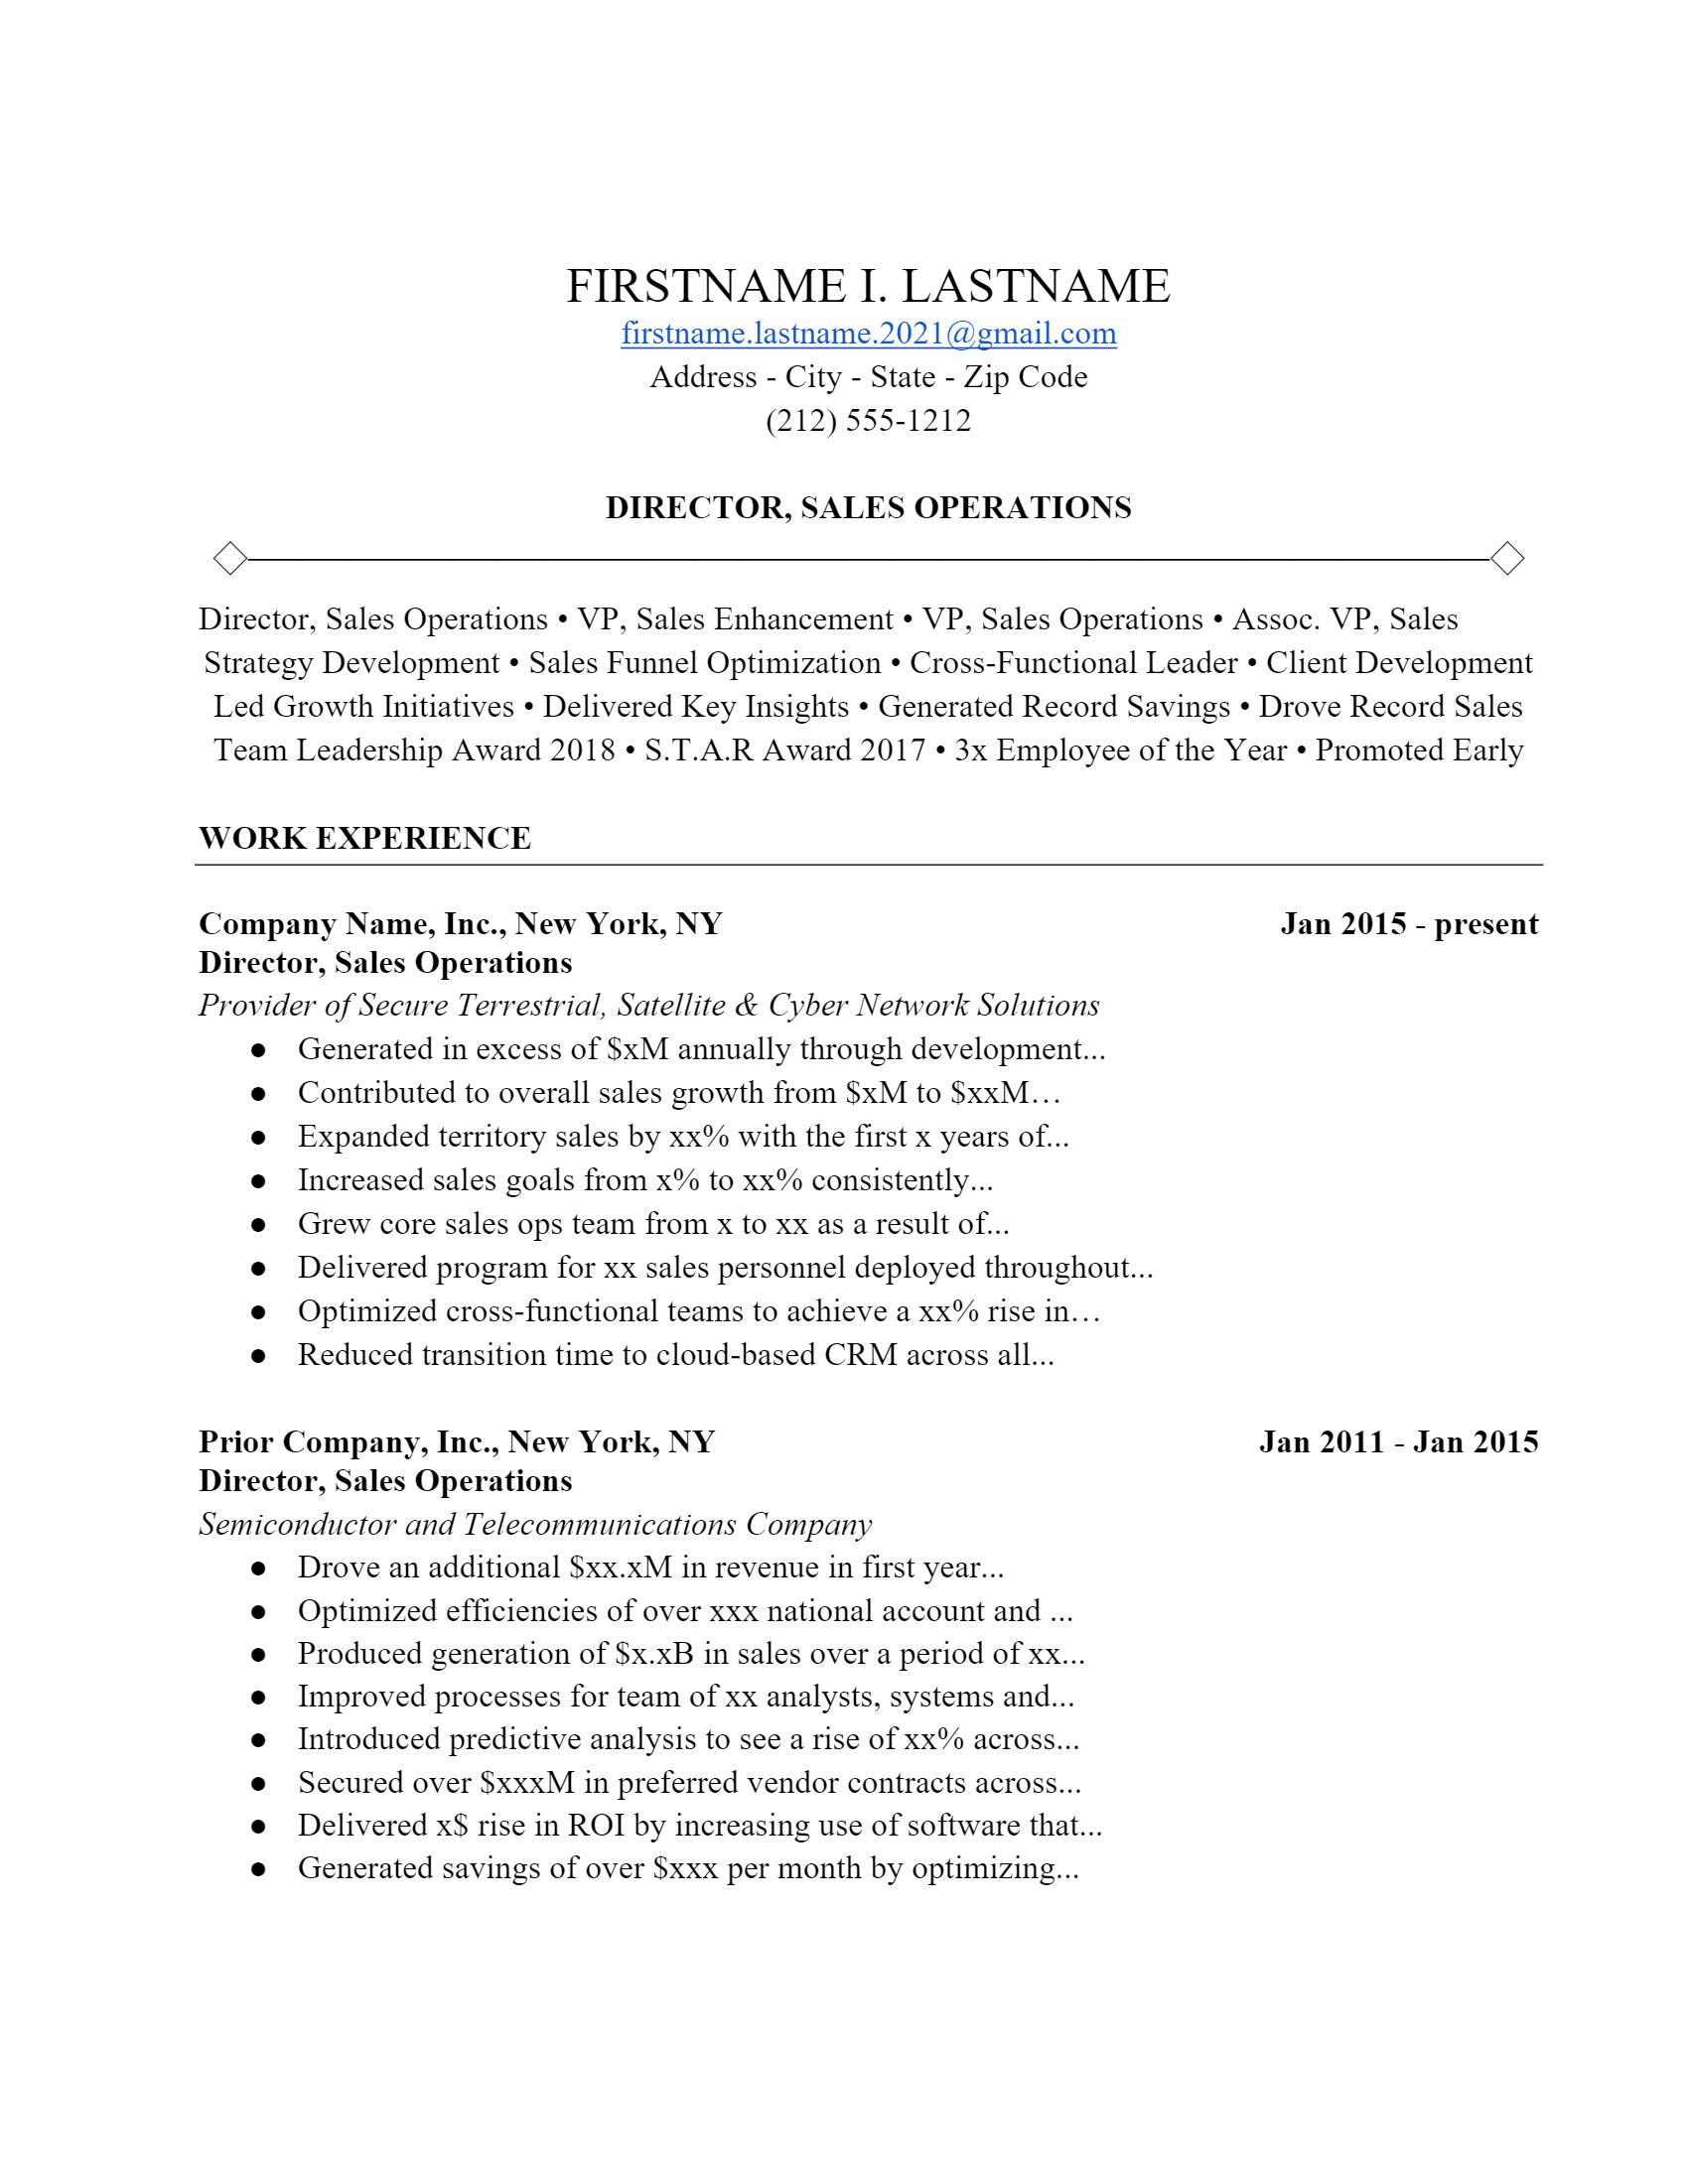 Sales Operator Resume > Sales Operator Resume .Docx (Word)